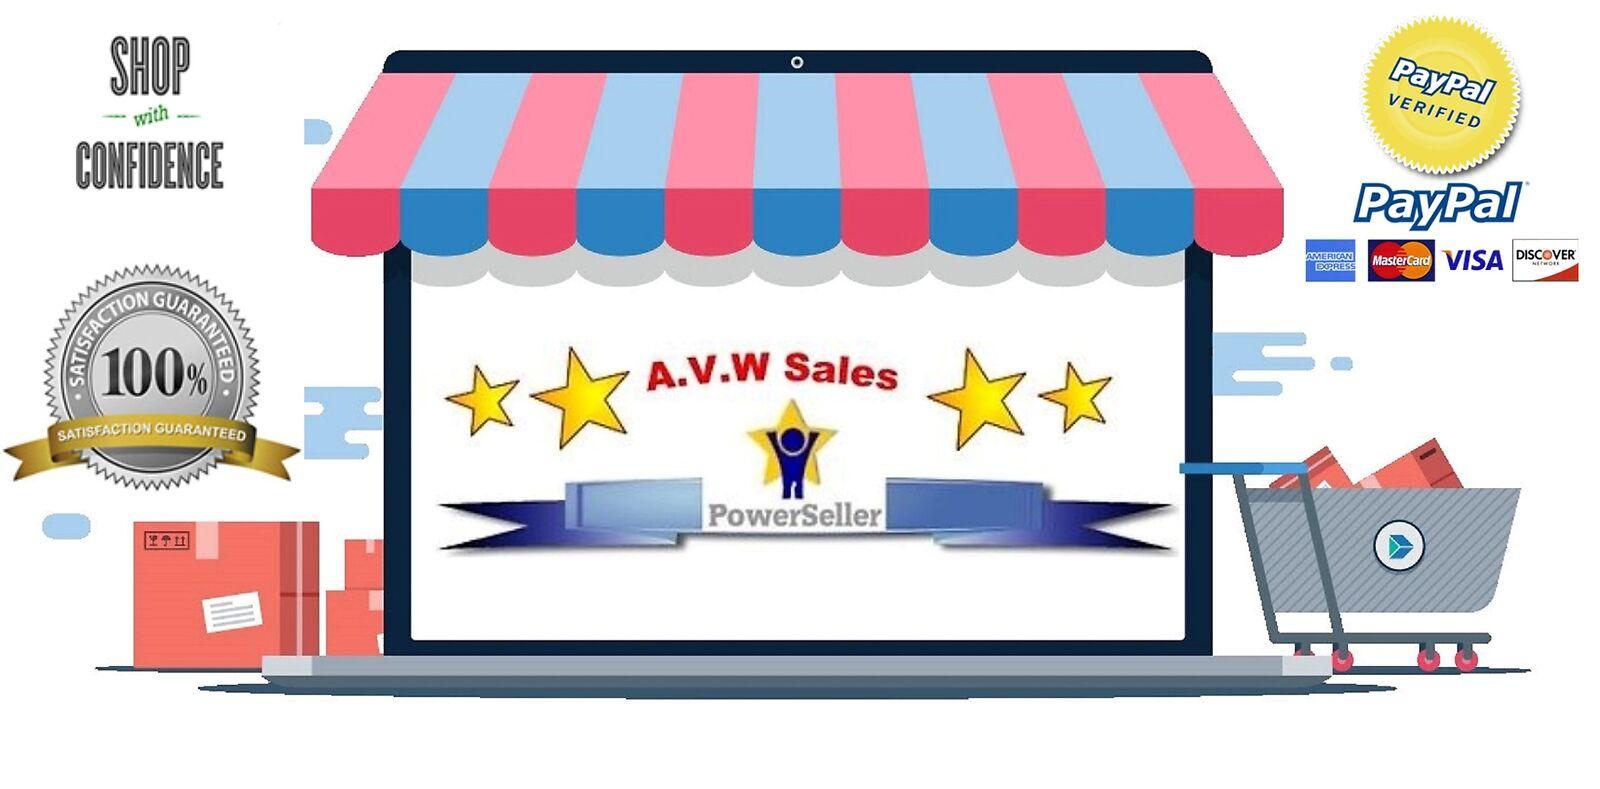 A.V.W Sales